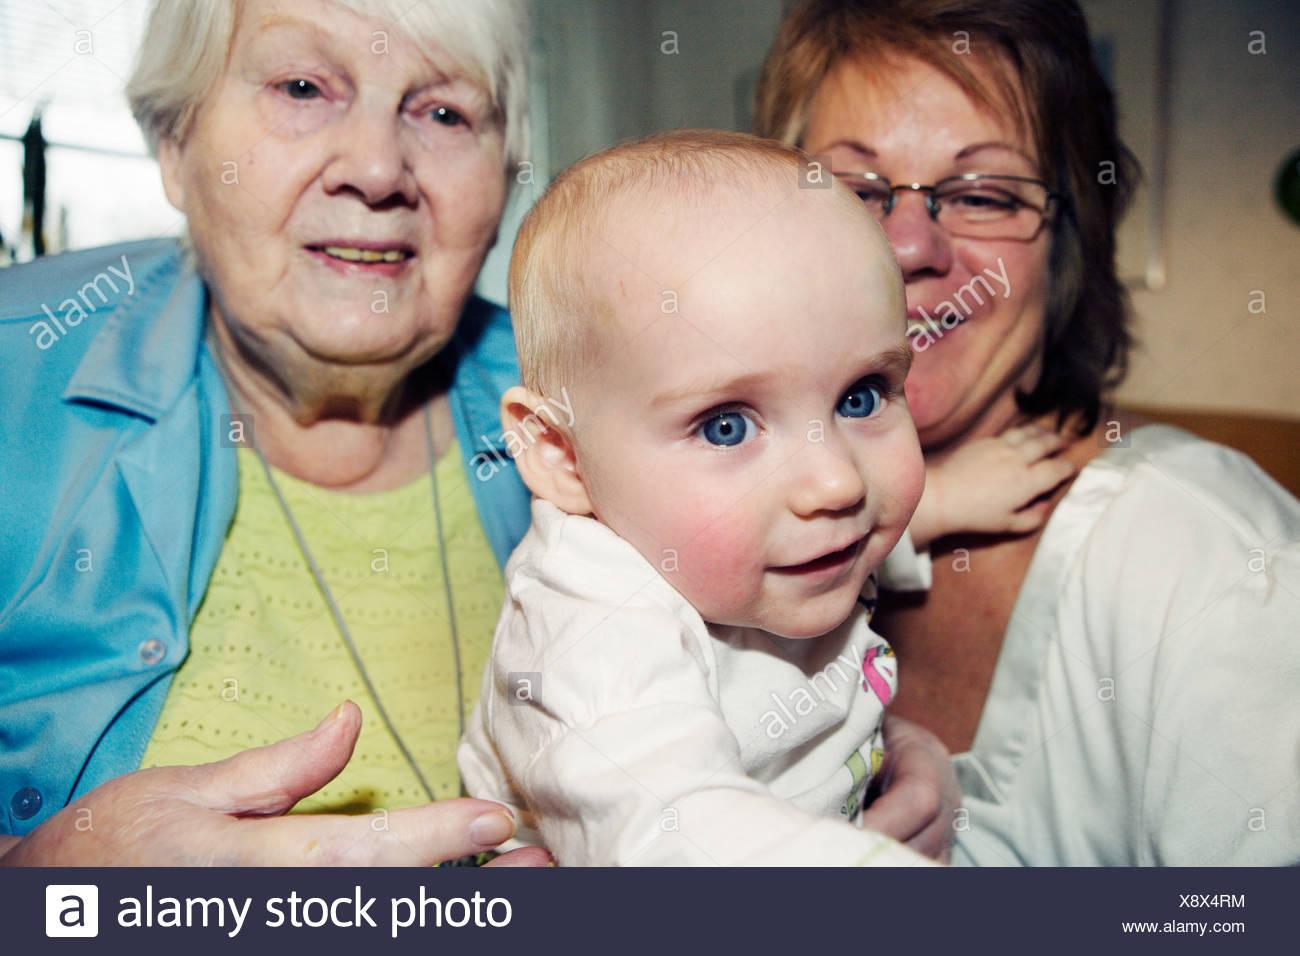 Three generations Sweden. - Stock Image